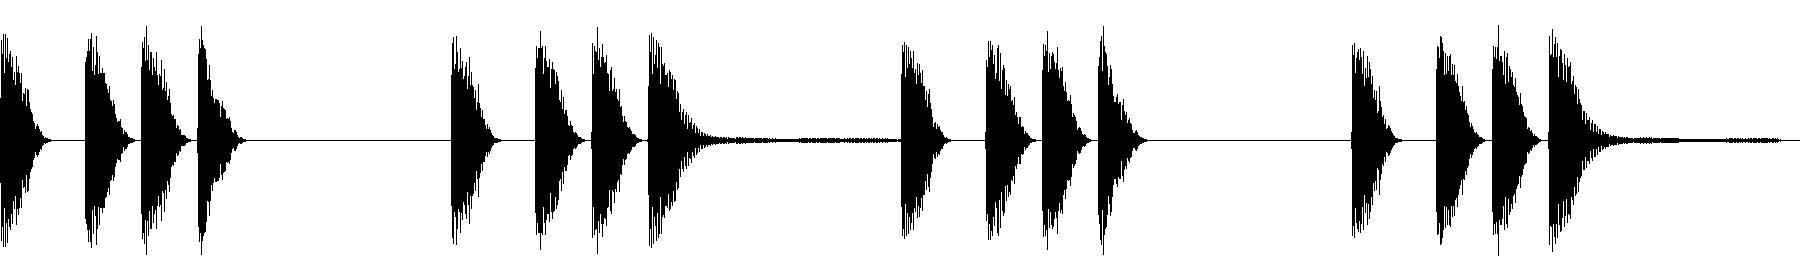 dts chordlp 13 cm dry